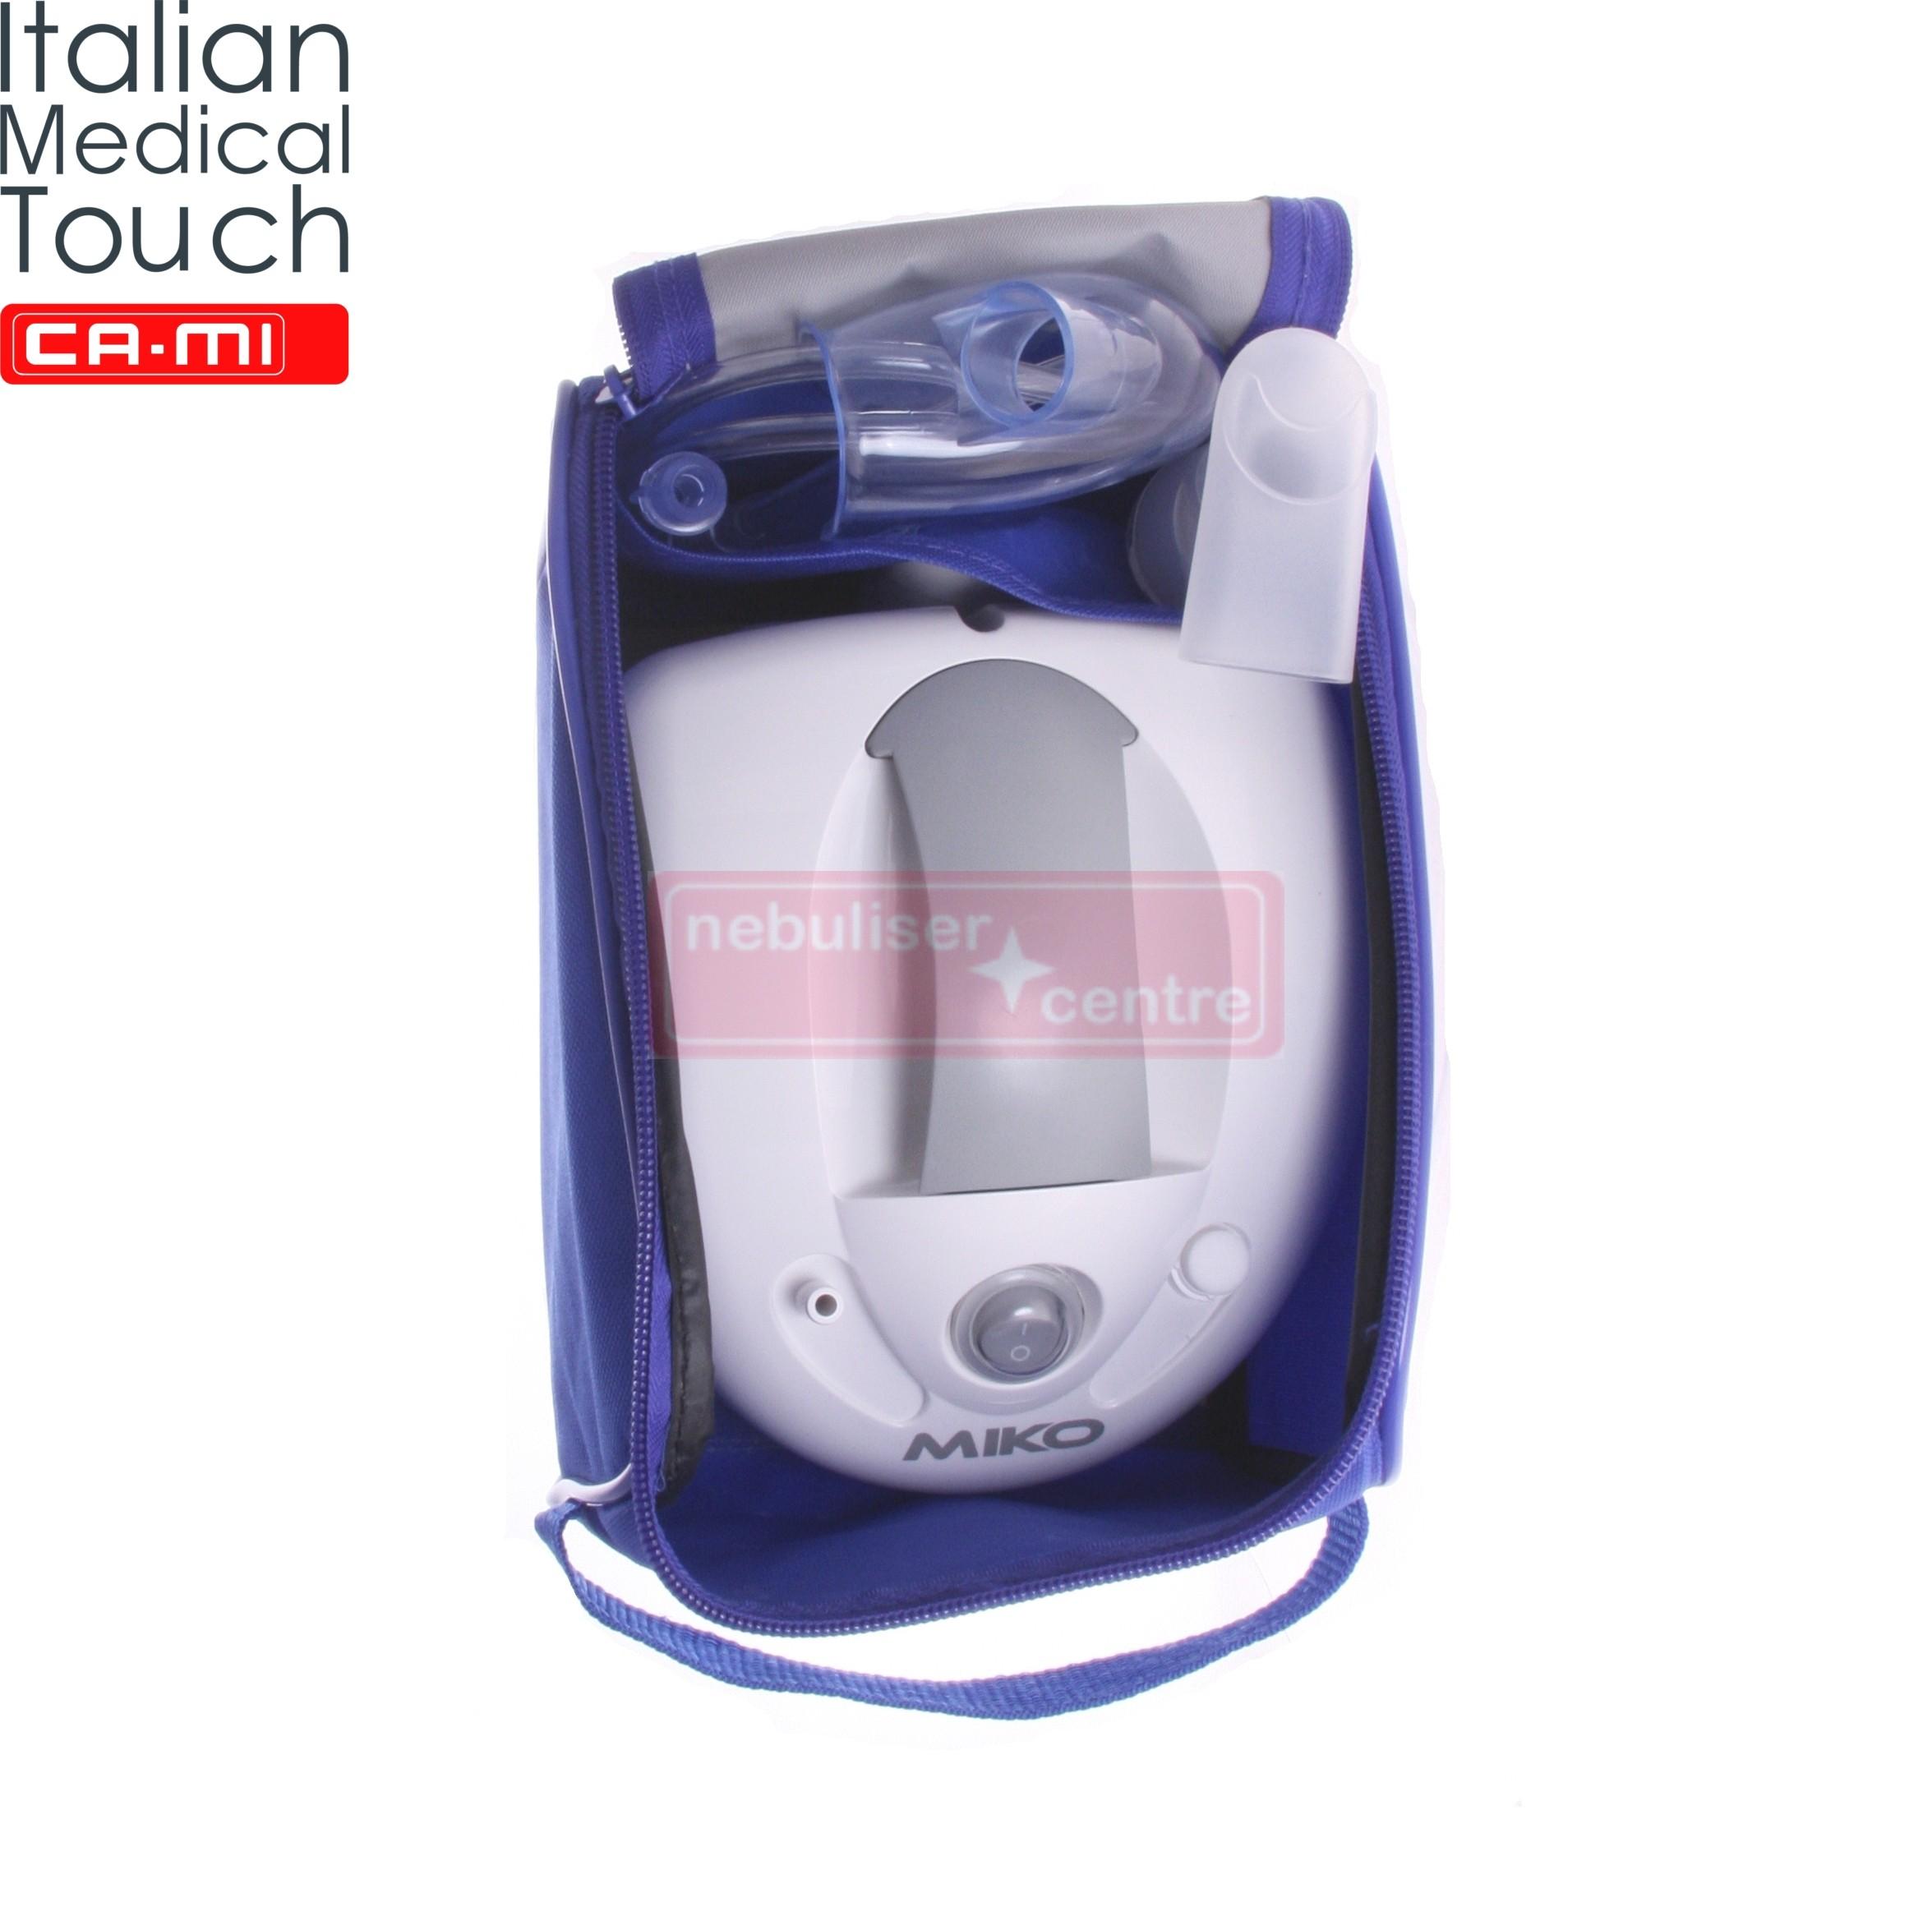 Asthma Nebuliser CA-MI Miko. Recommended Nebuliser for Asthma